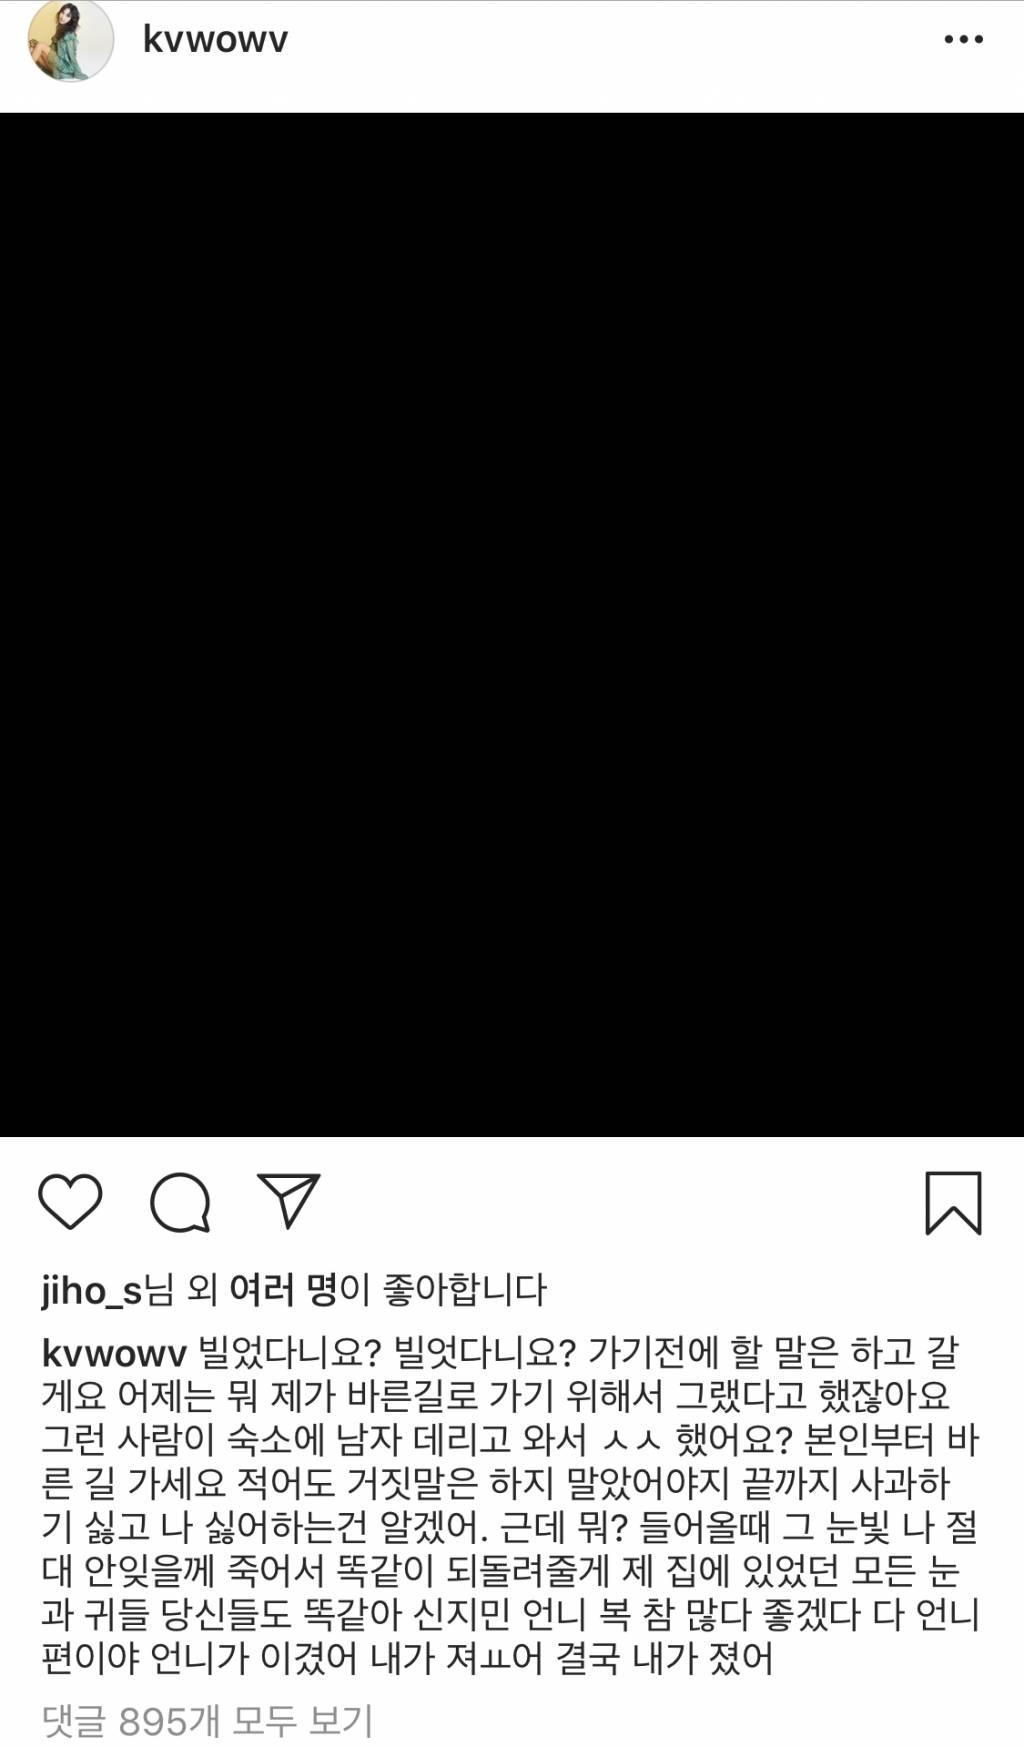 AOA민아 지민 끝나지않은 이야기 (feta. ㅅㅅ)